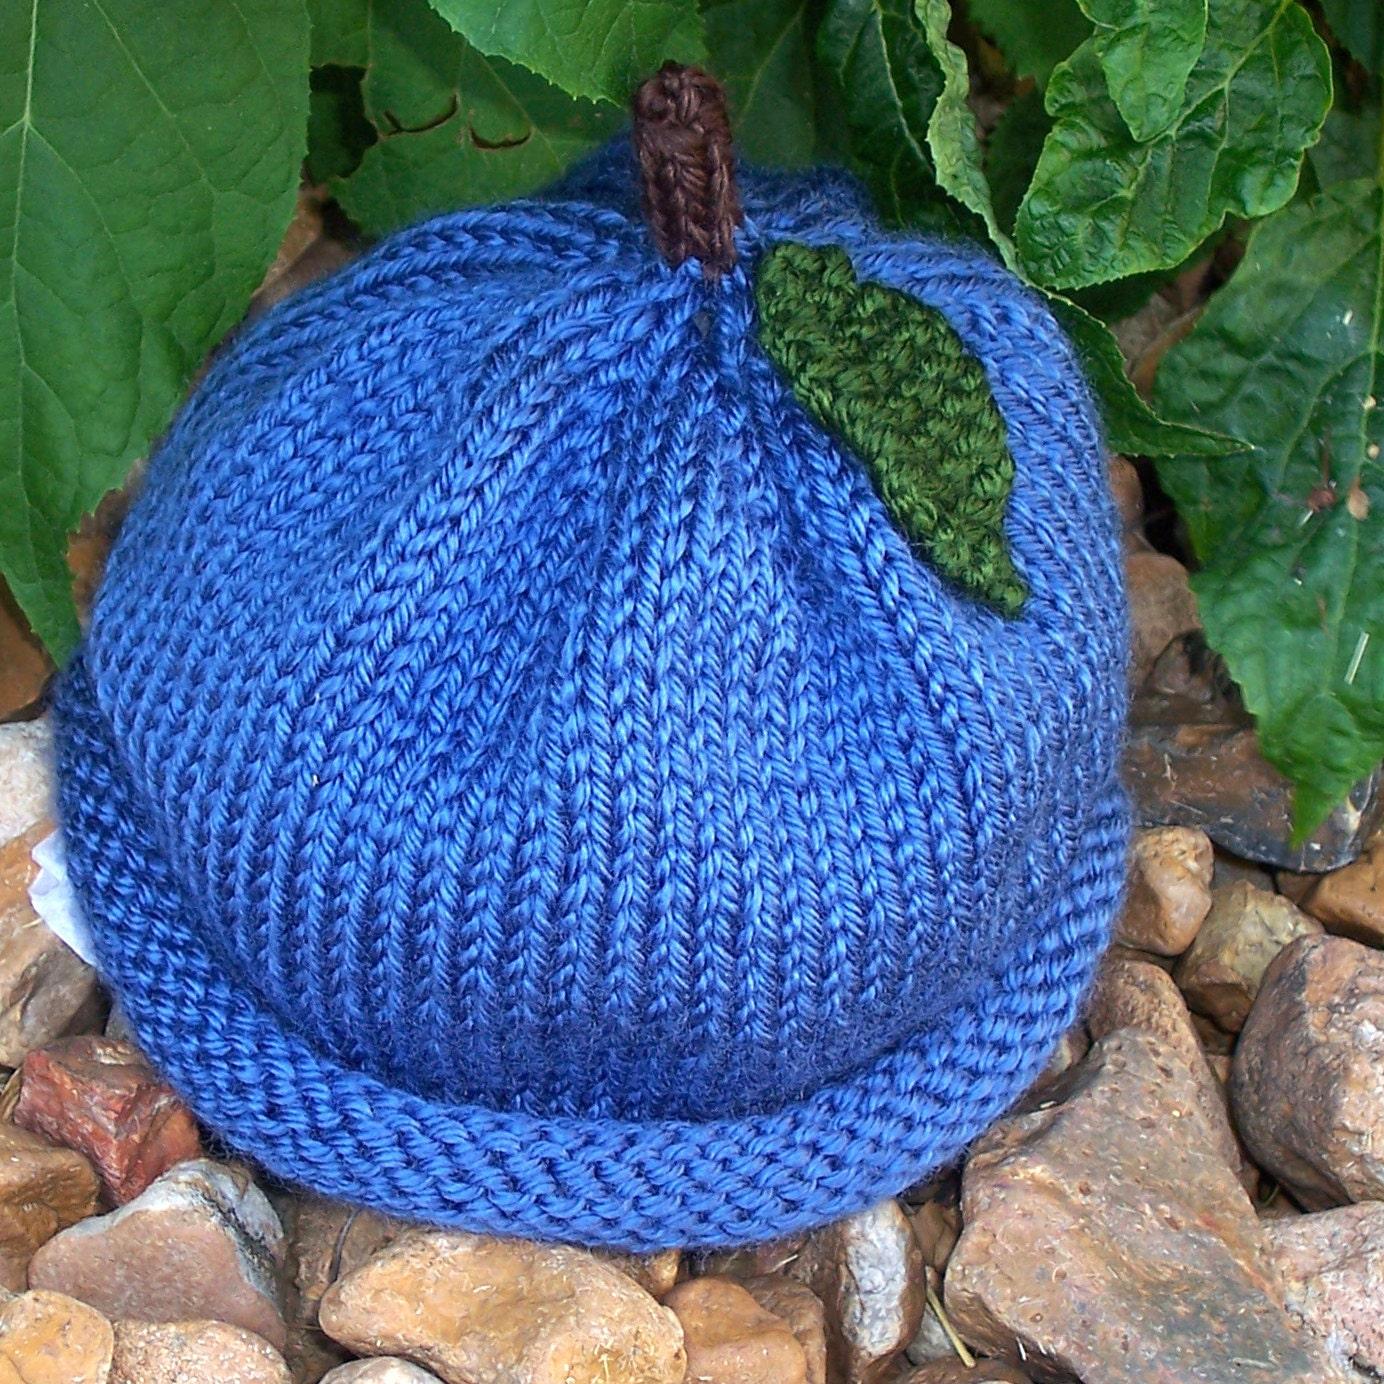 Knitting Expat Etsy : Pattern blueberry knit baby hat by zigzdesigns on etsy